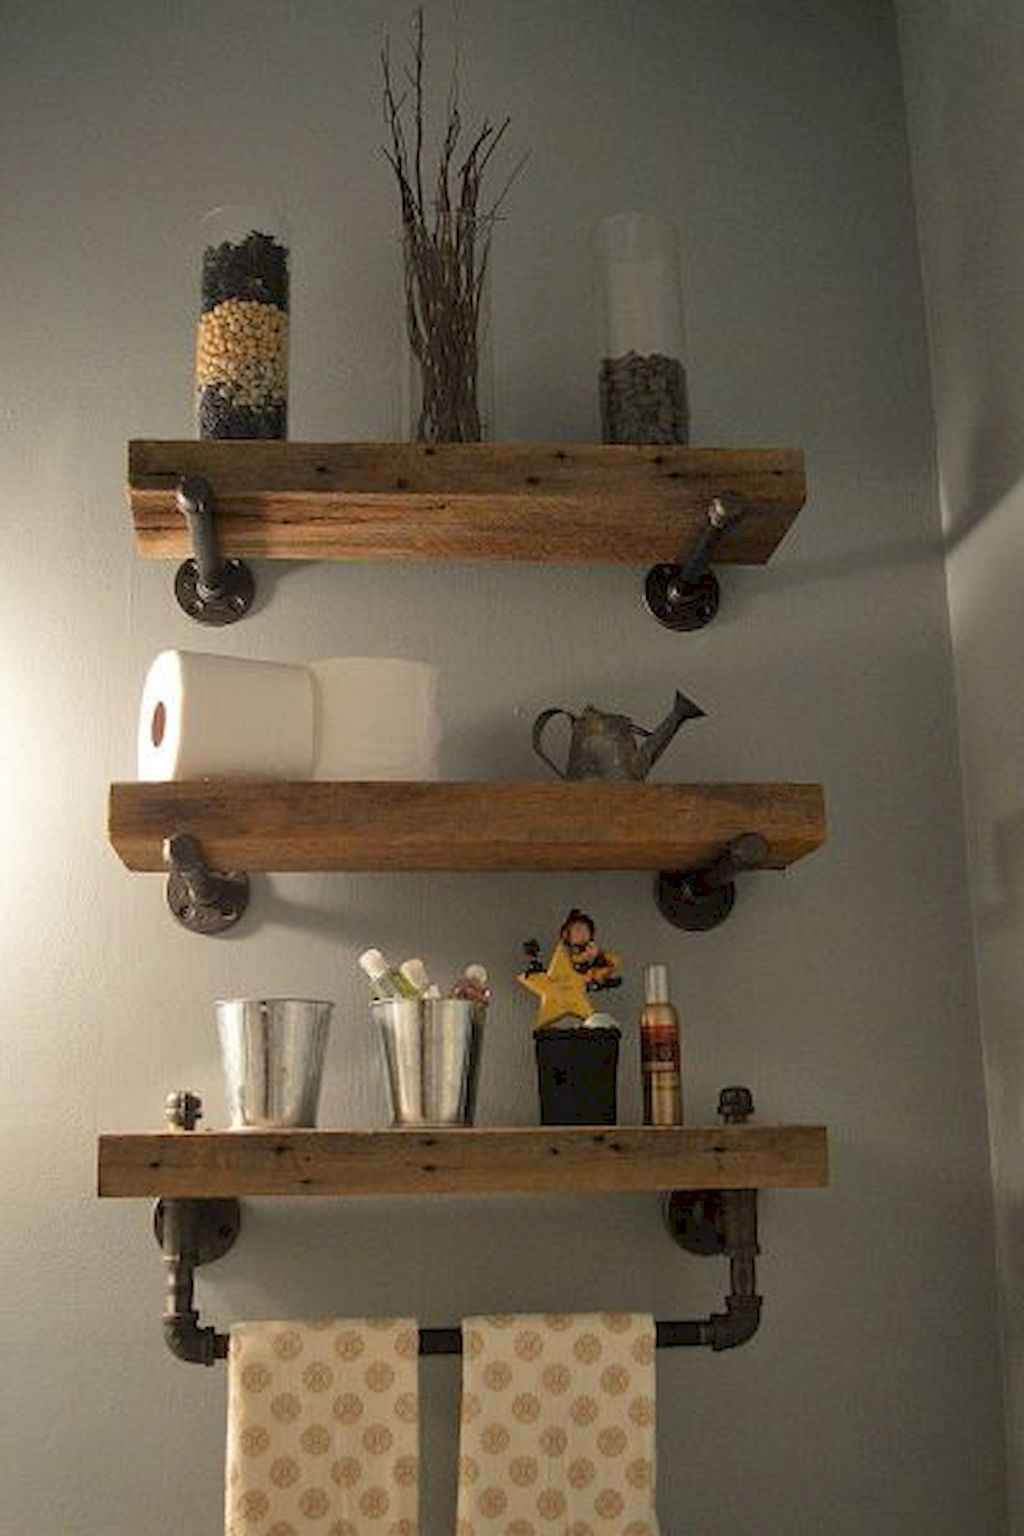 Cool bathroom storage shelves organization ideas (42)